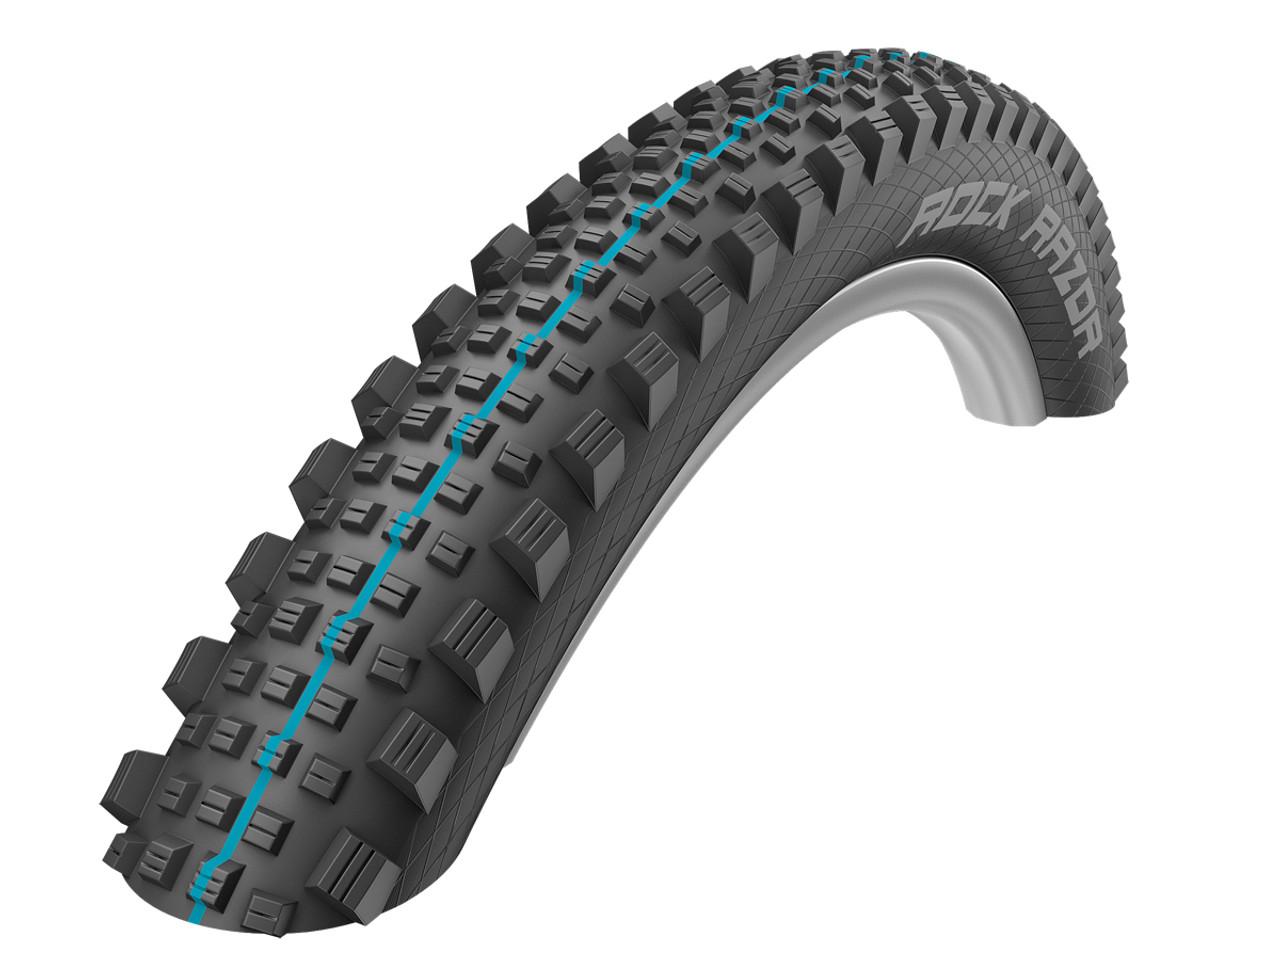 Schwalbe Addix Rock Razor Evo SpeedGrip TL-Easy Apex Folding Tyre 27.5 x 2.60